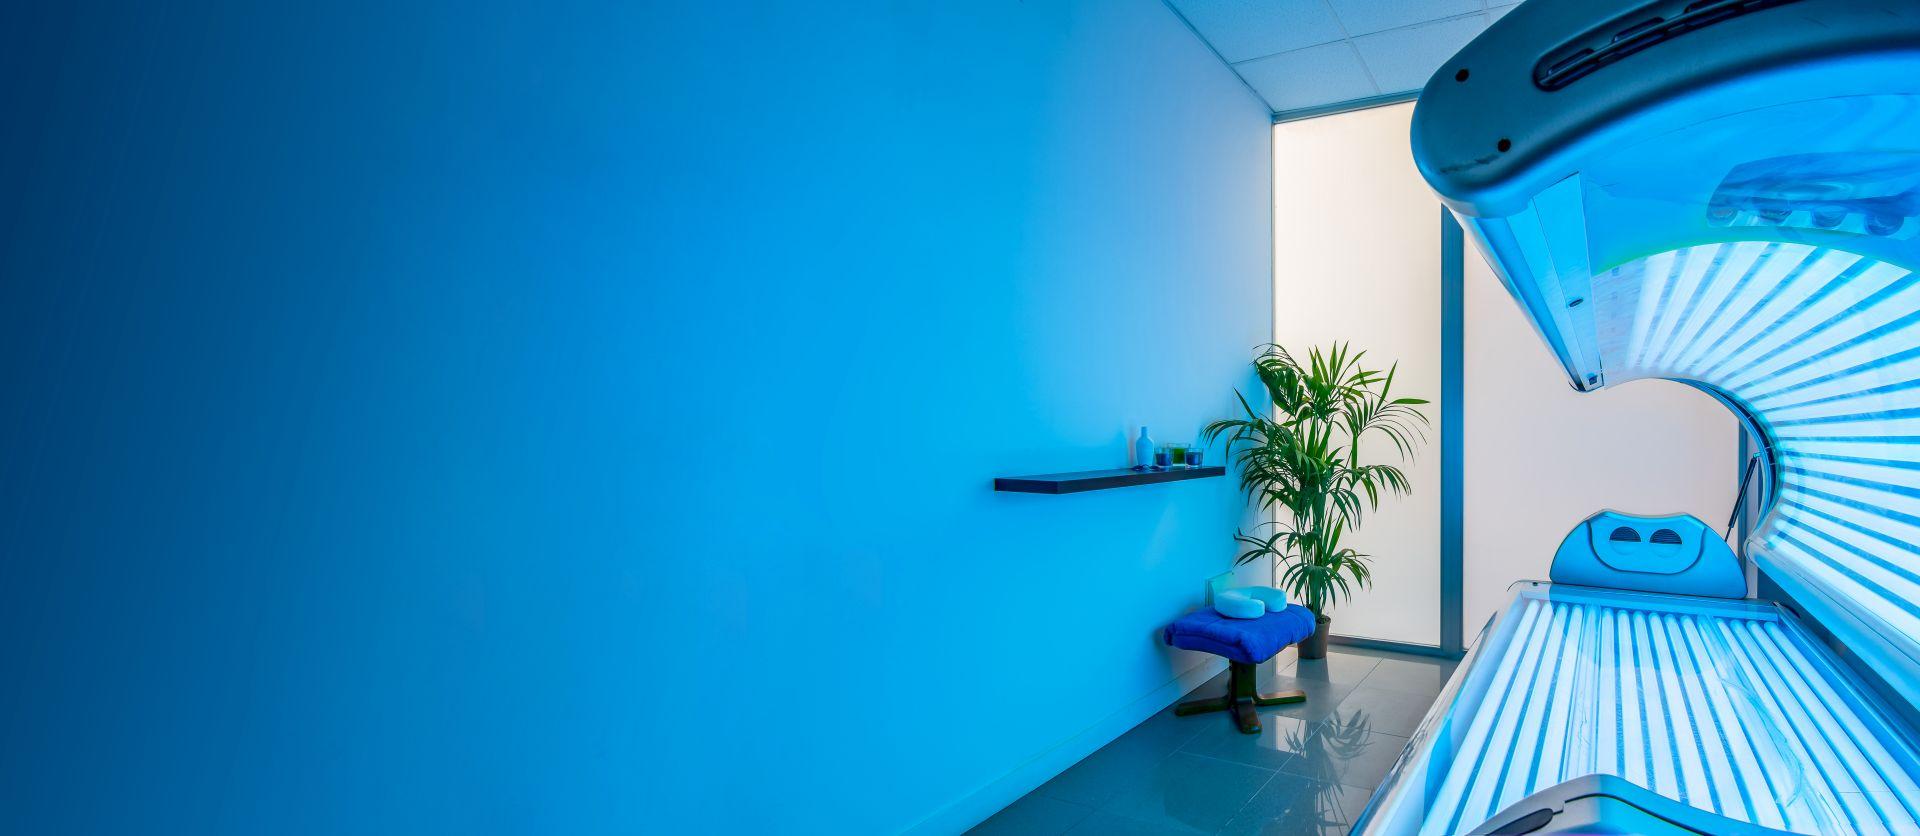 Solariumkabine in Blau gehalten